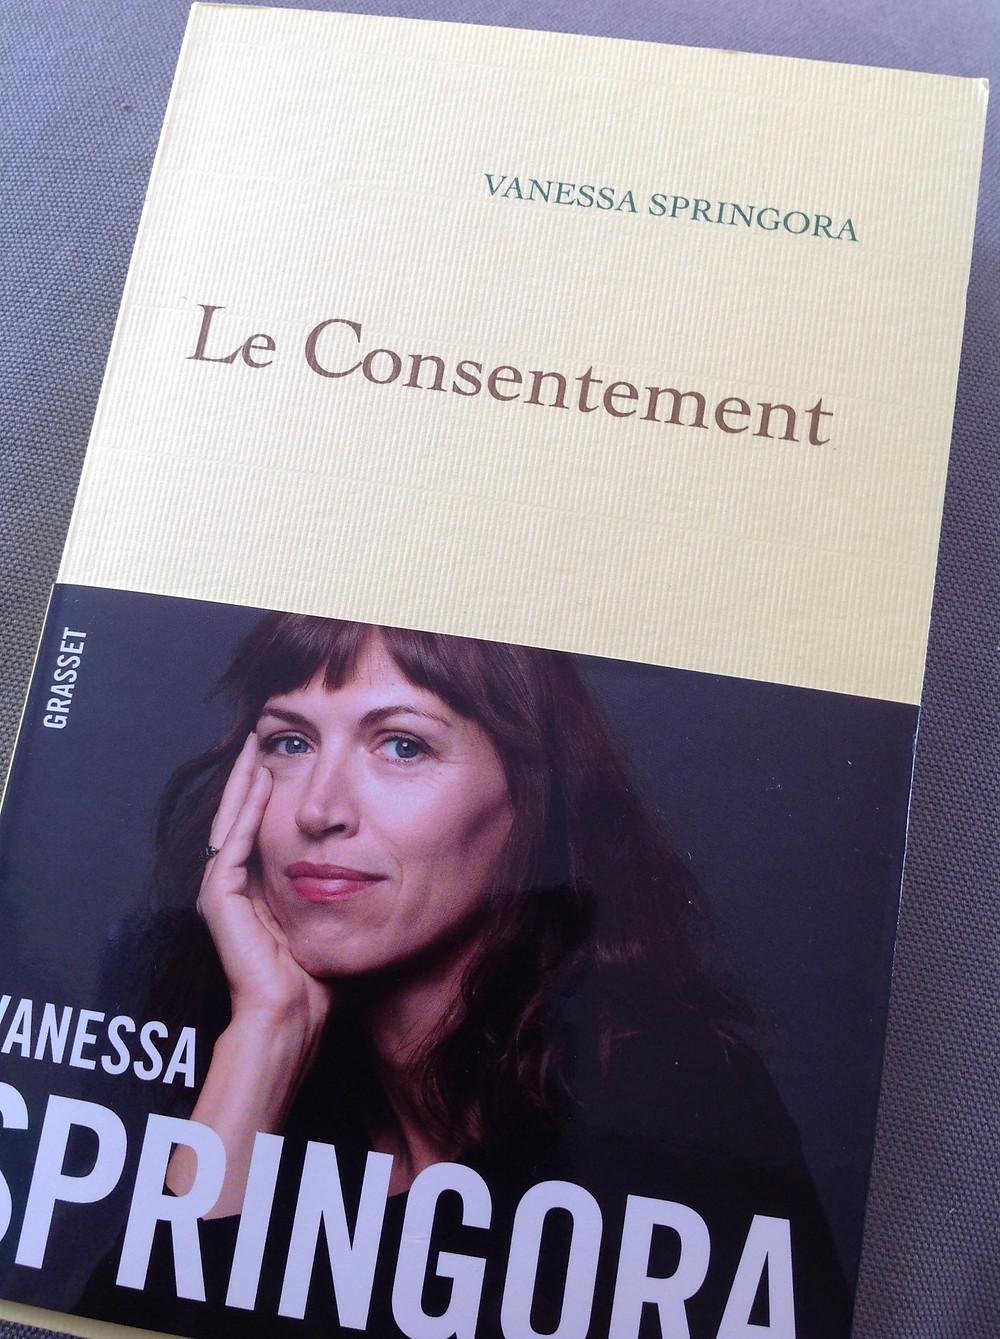 Le Consentement, Vanessa Springora, Grasset